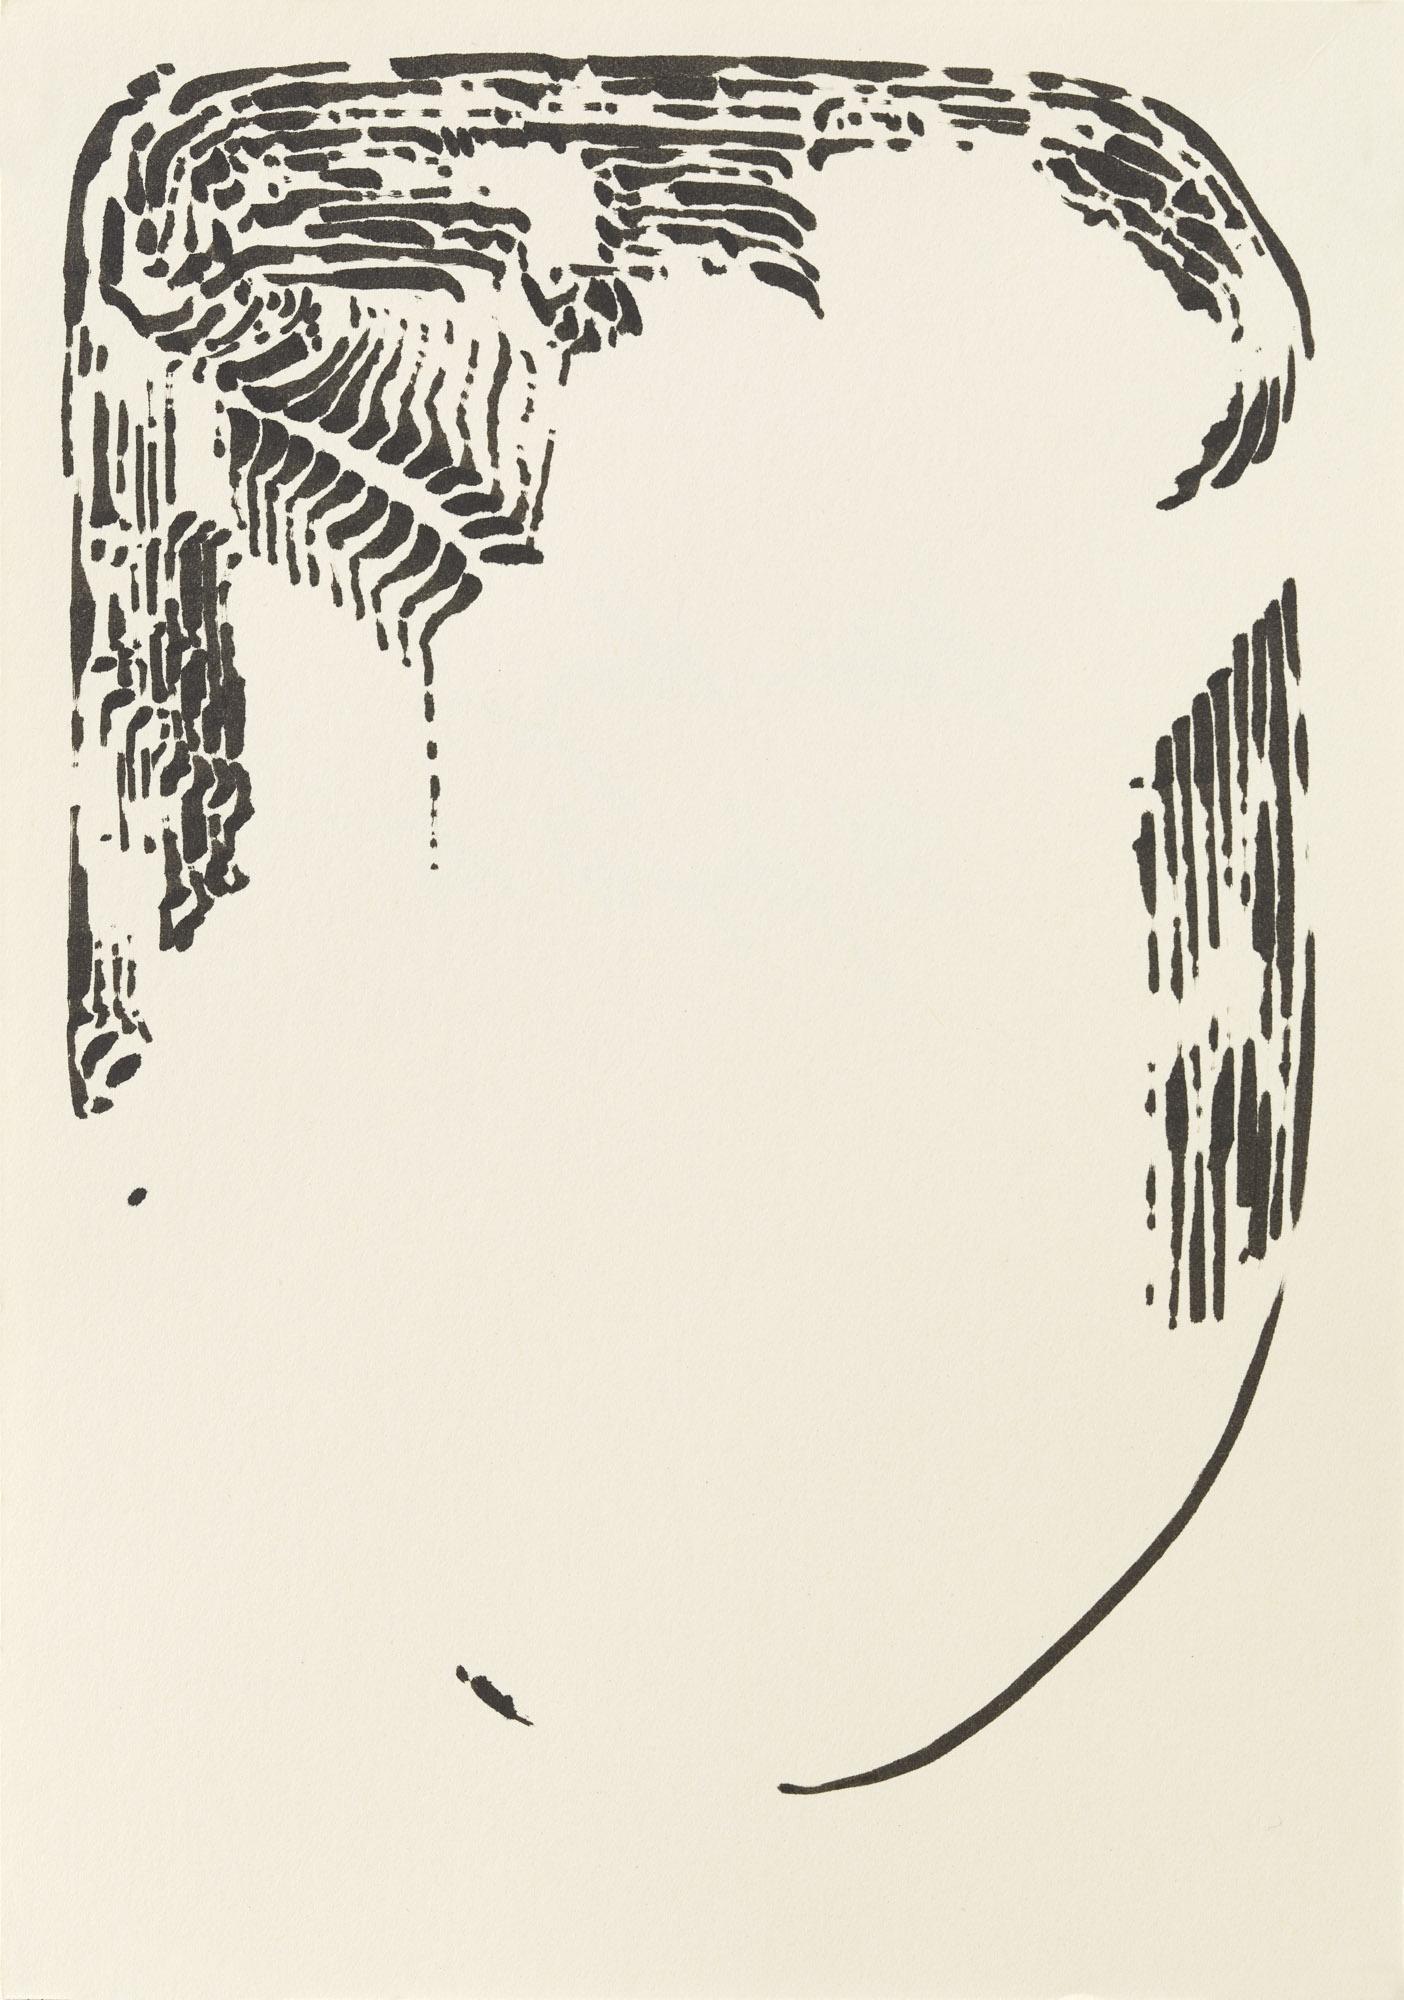 BK P7538 | untitled | ink on paper | 21x15cm | 2015